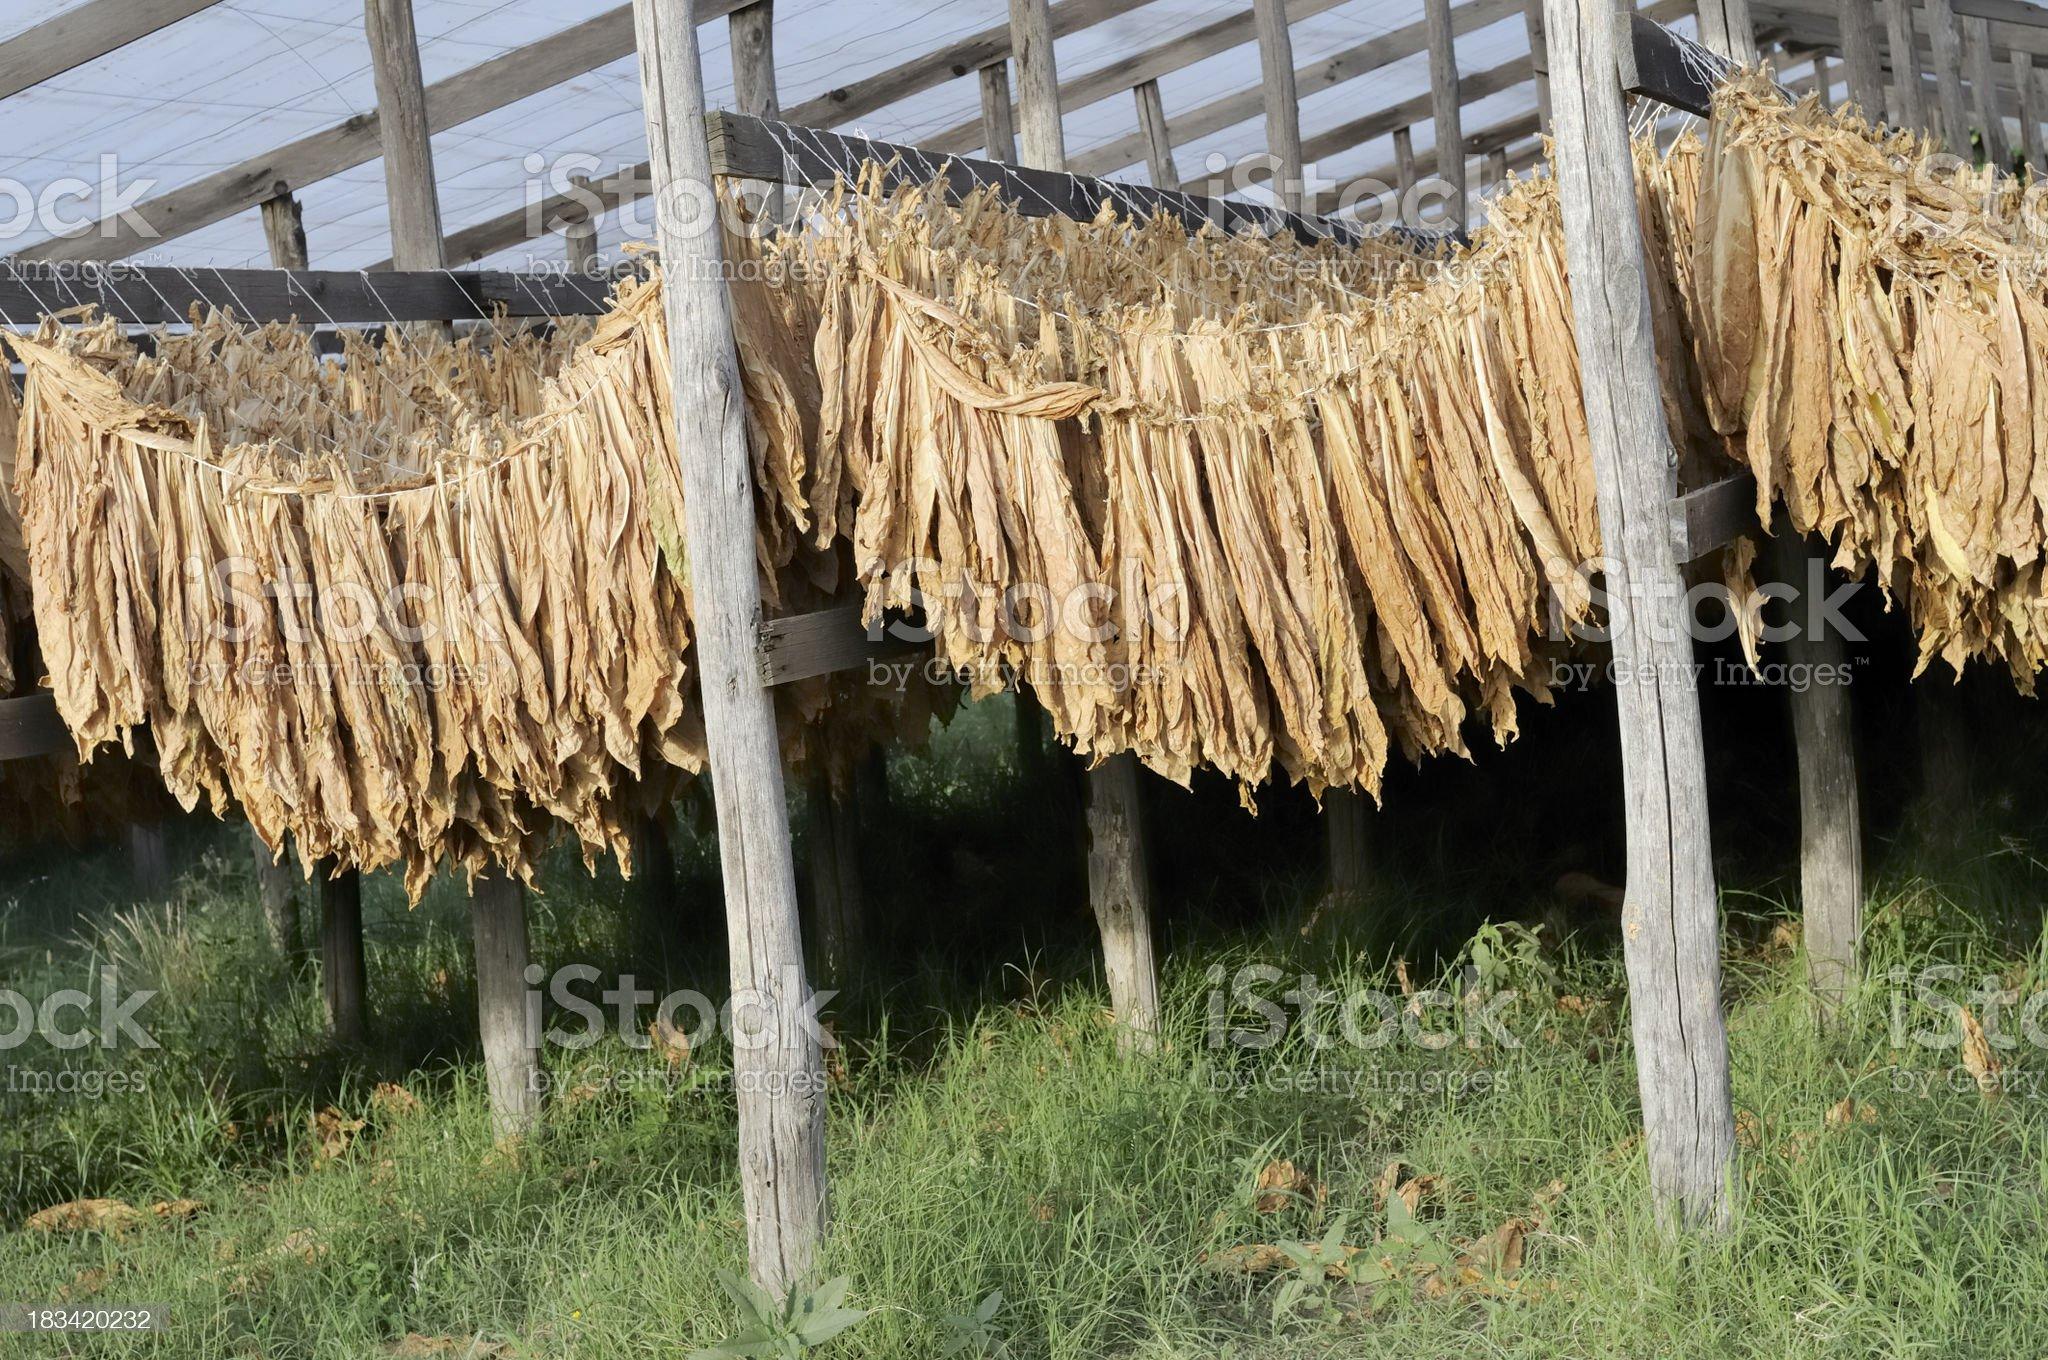 Tobacco royalty-free stock photo